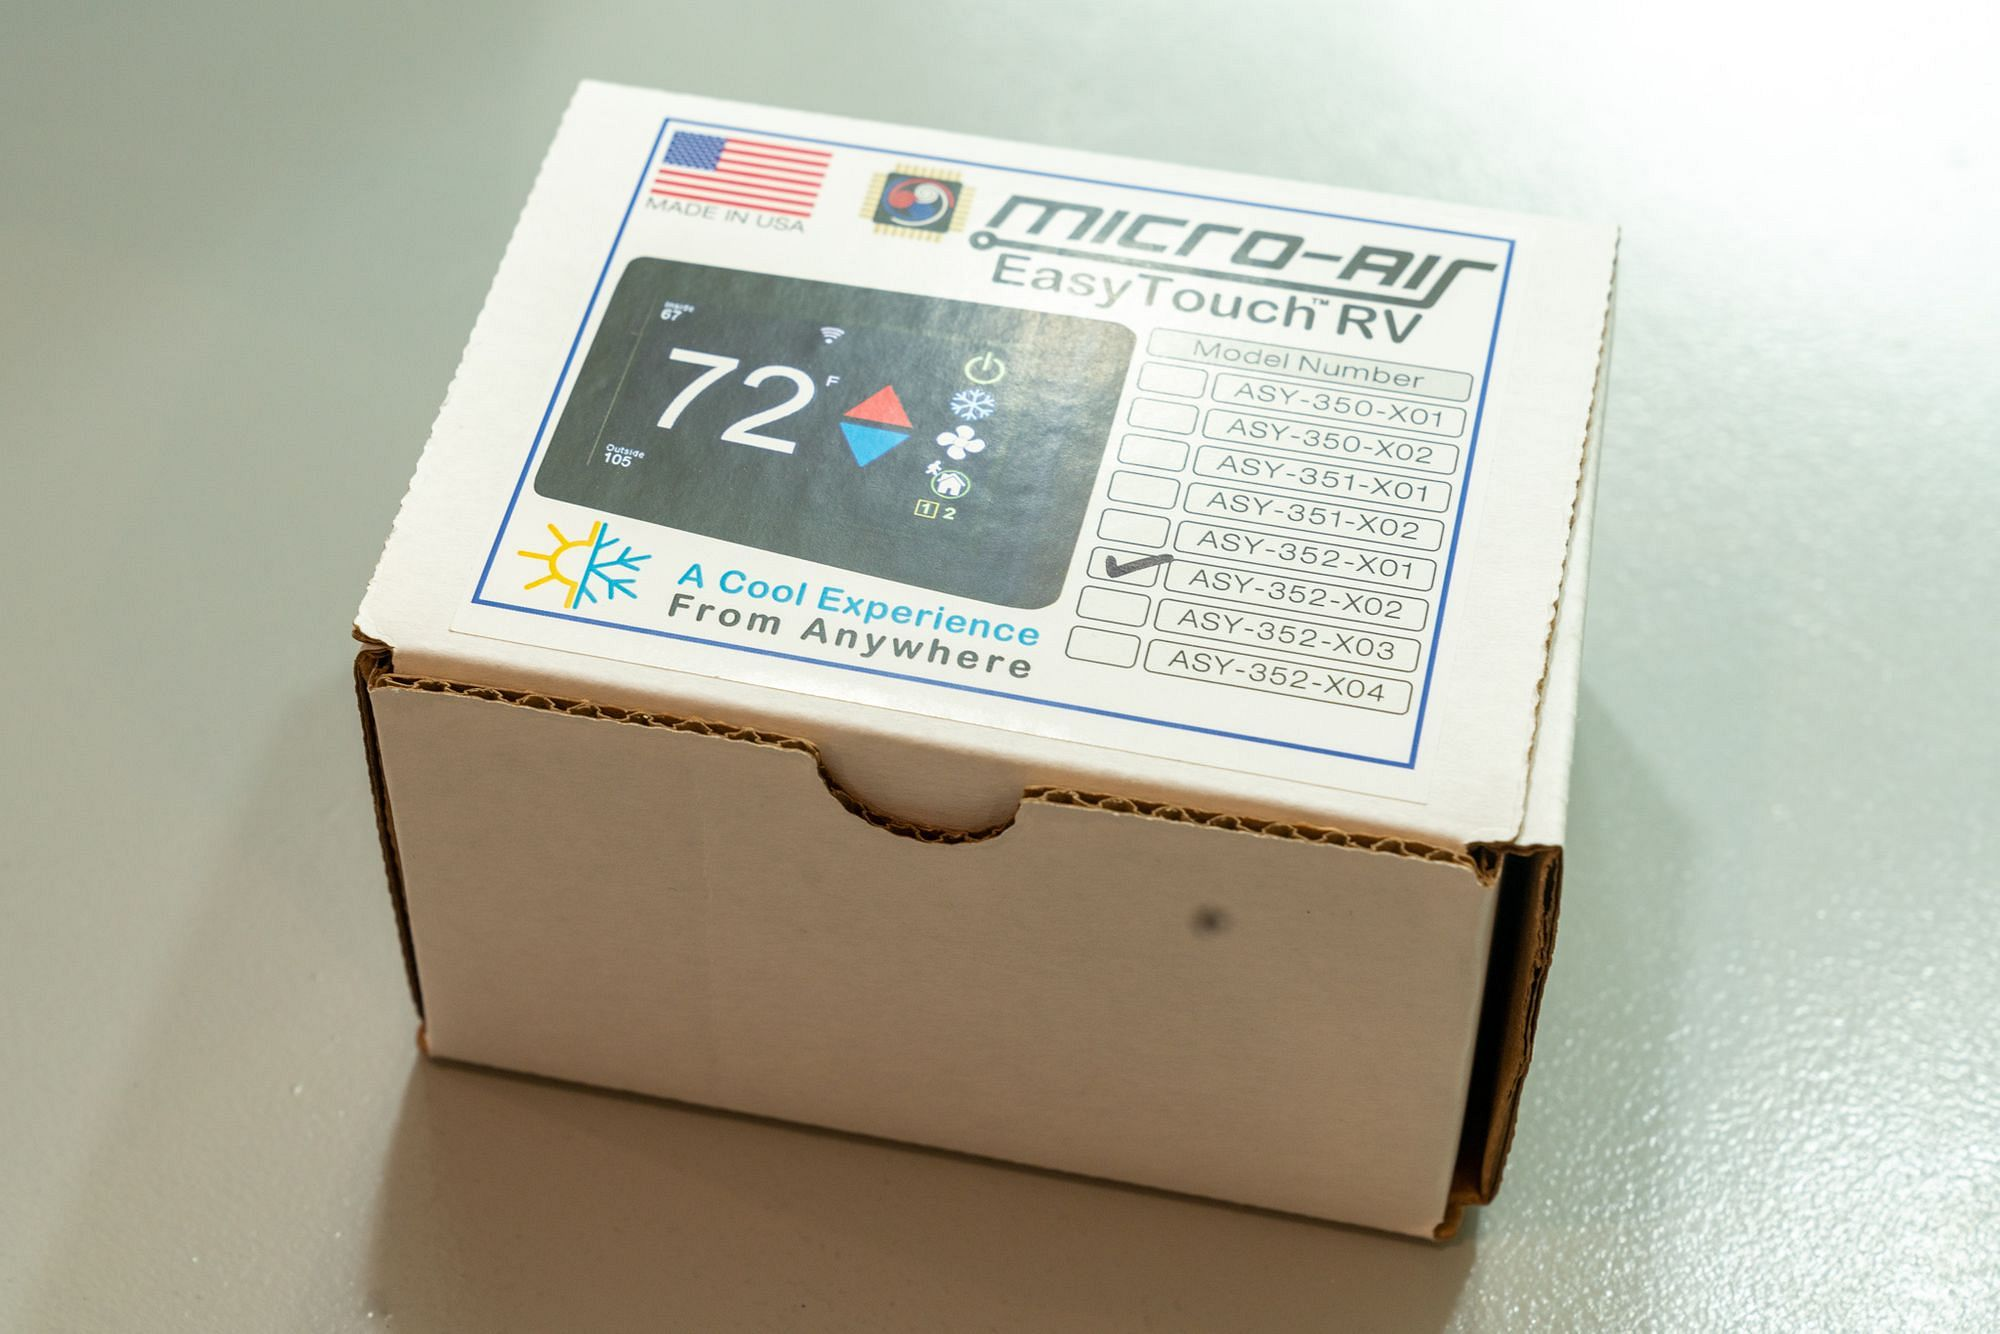 EasyTouch RV 352